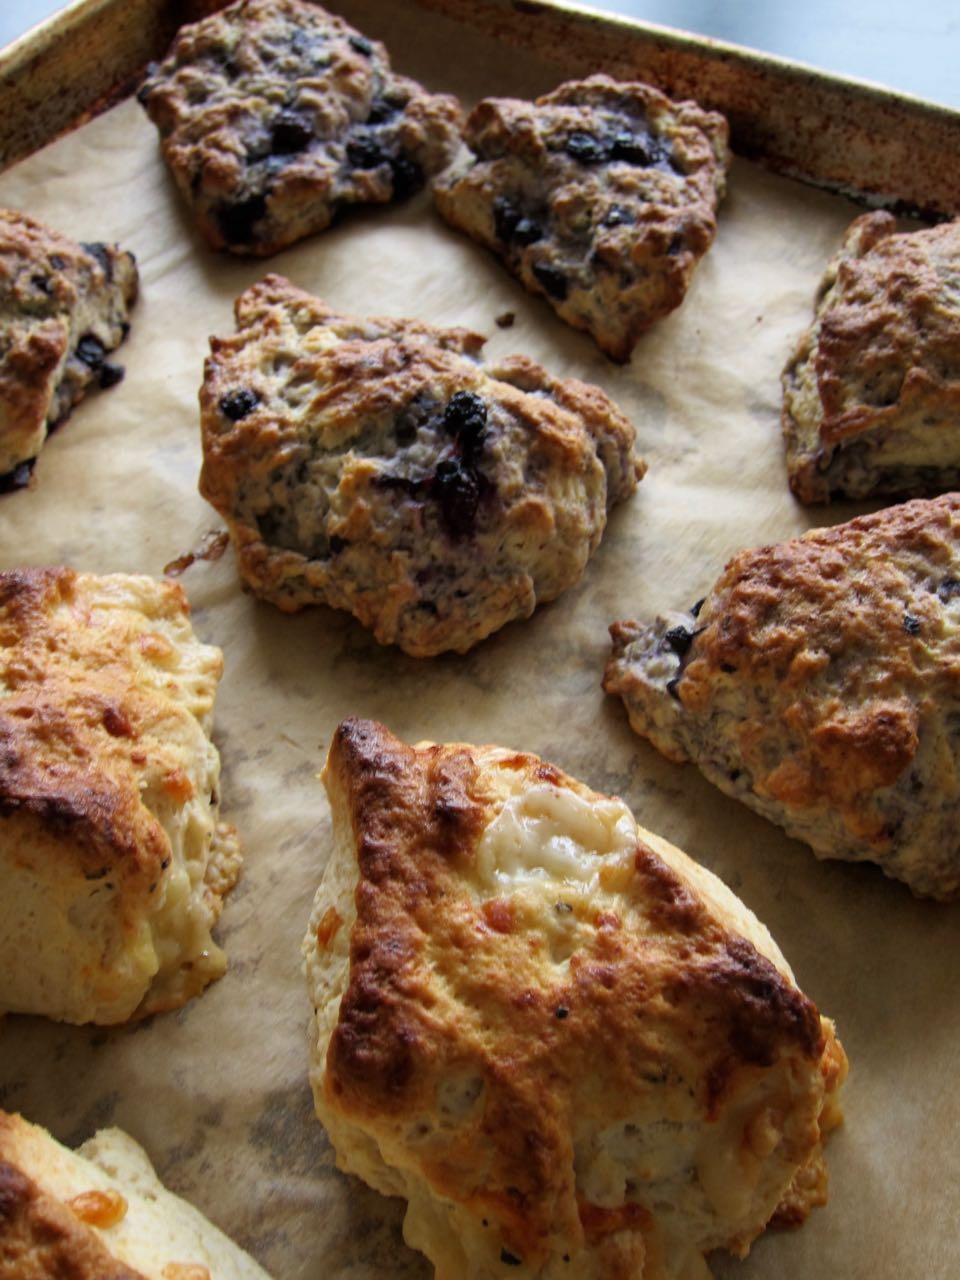 baked lemon blueberry and gruyere pepper scones